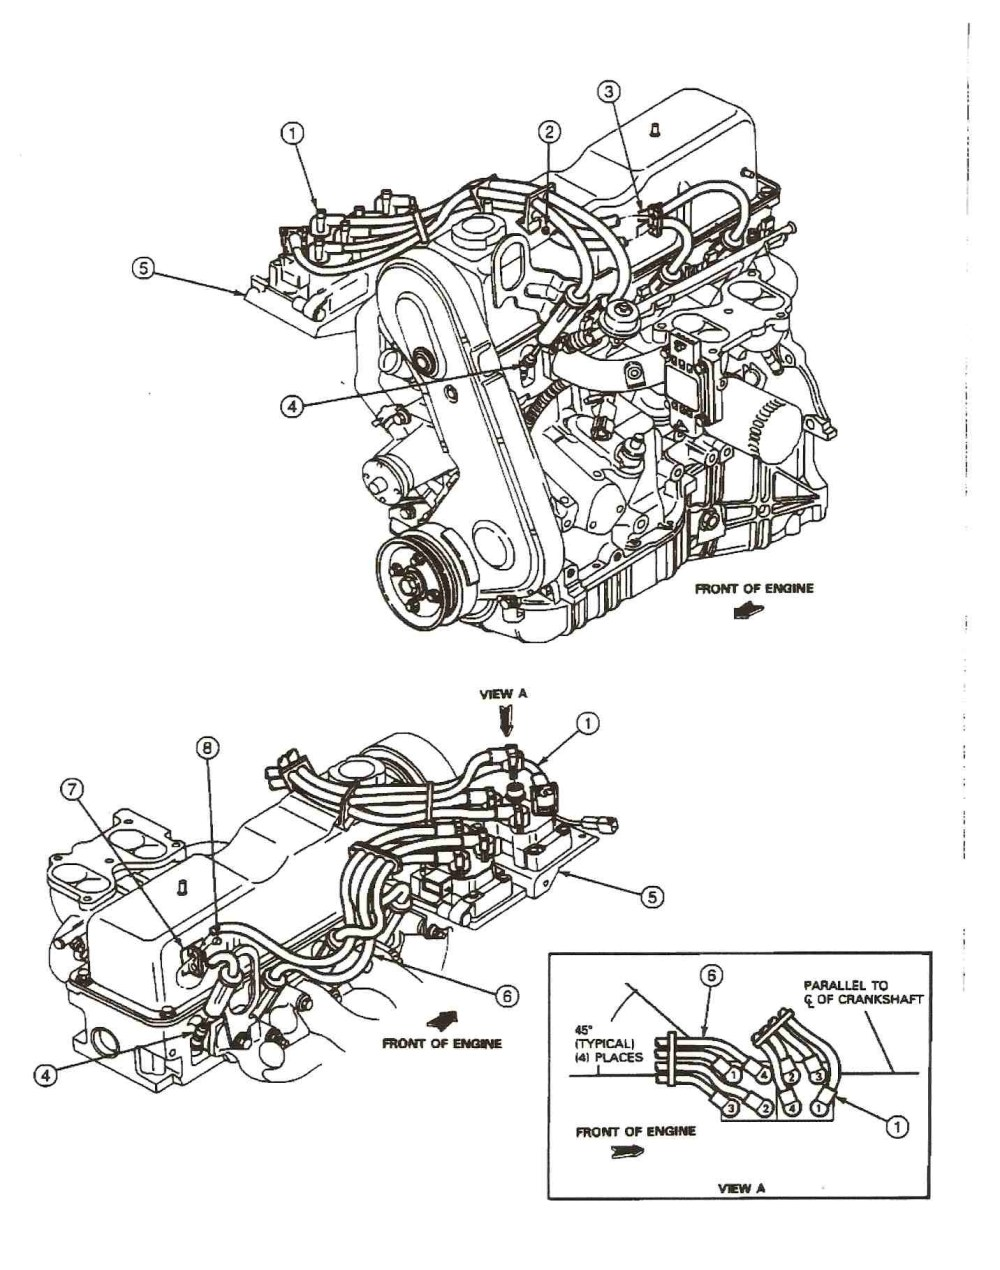 medium resolution of 1999 mazda b2500 engine diagram